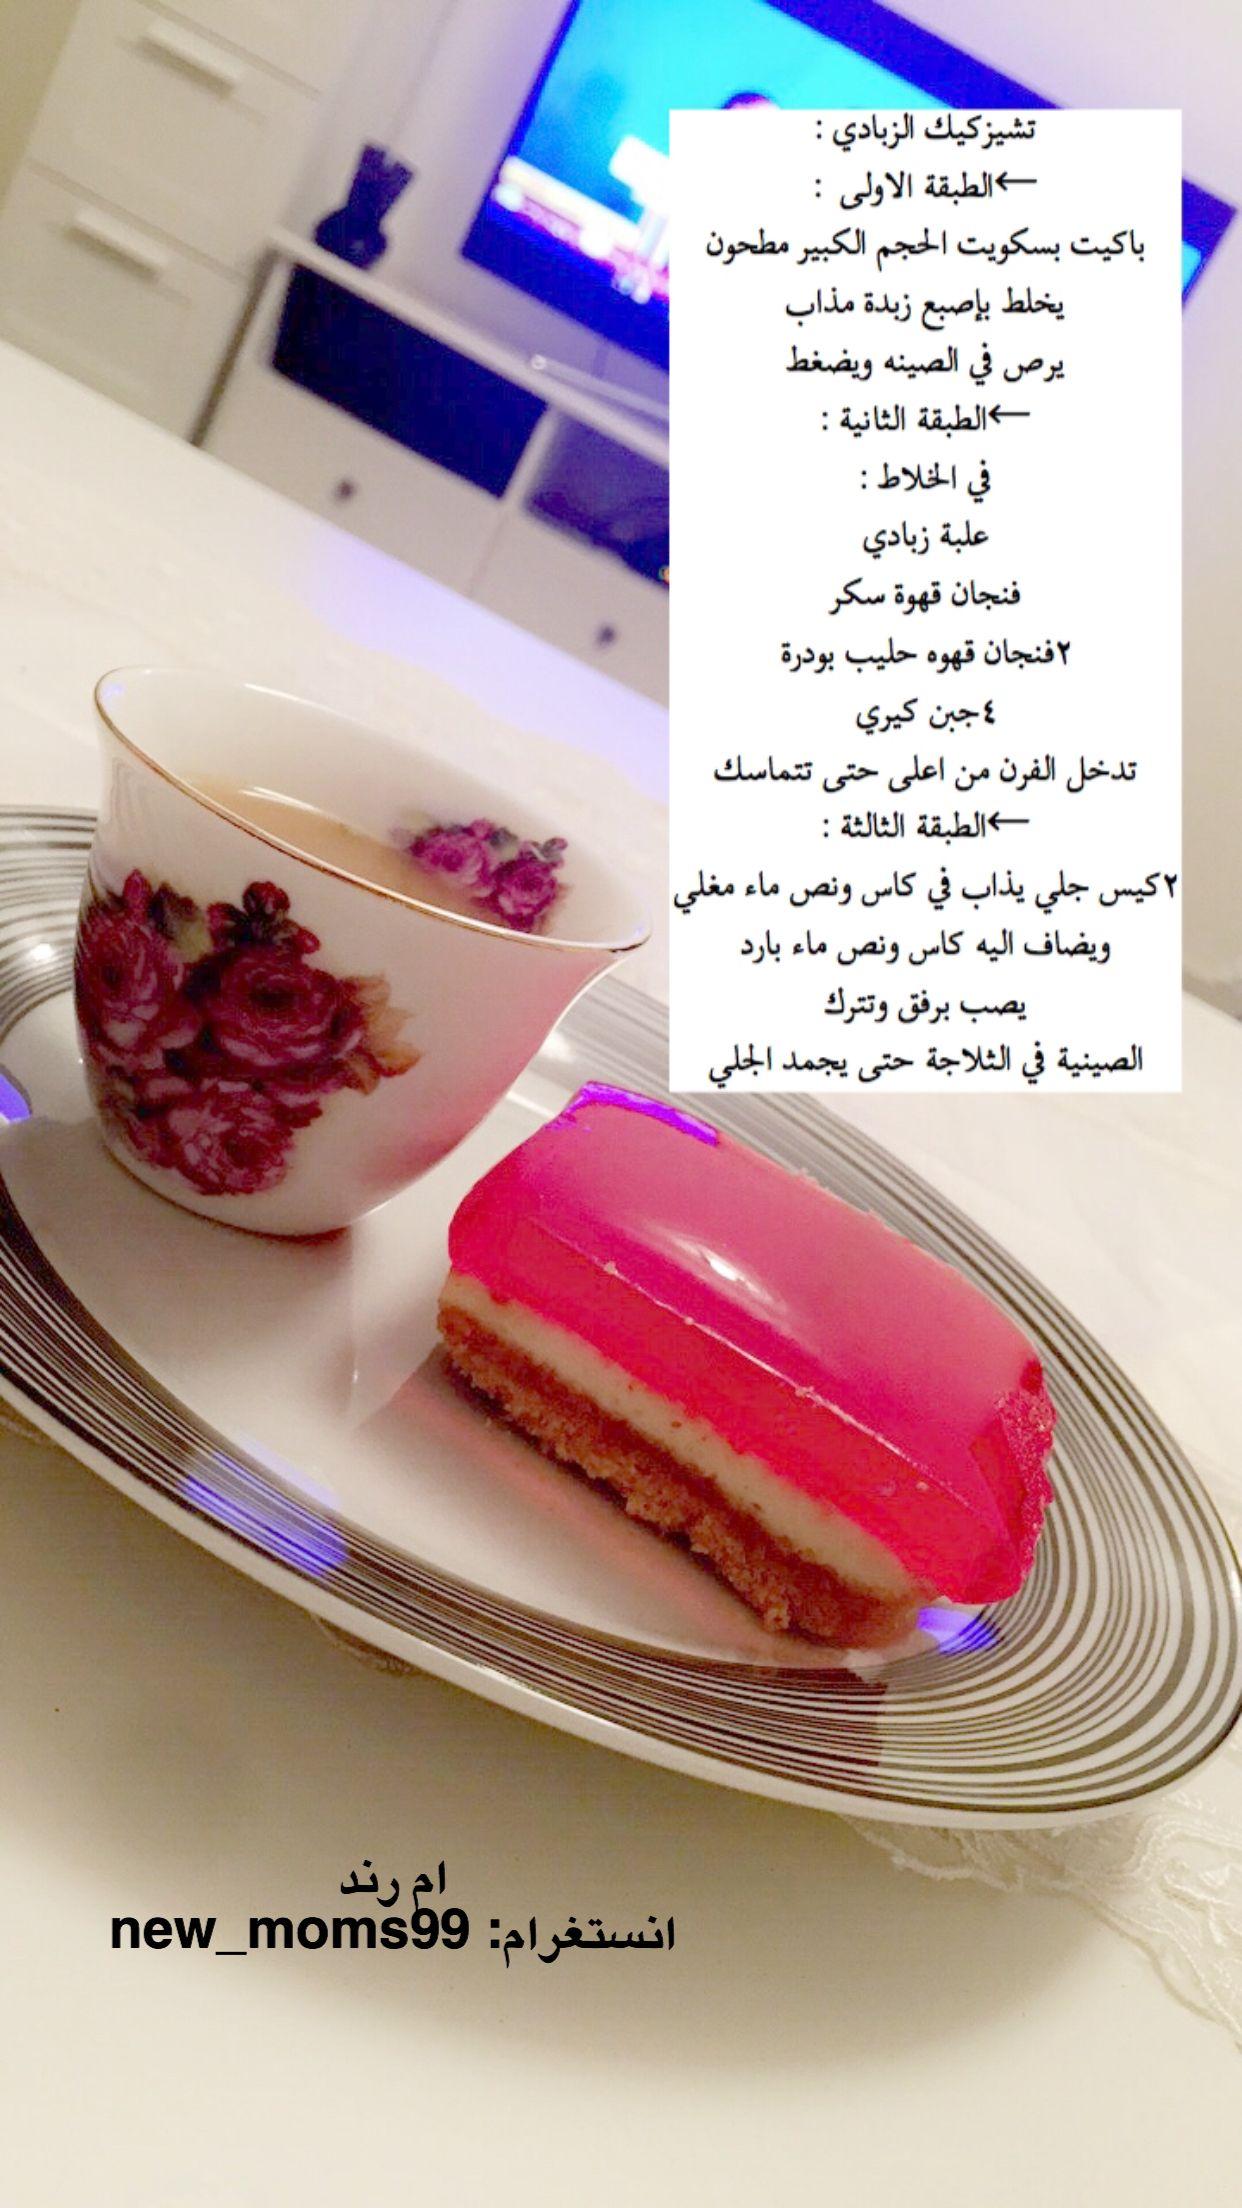 تشيز كيك الزبادي بارد يسرسح ام رند Cooking Recipes Desserts Libyan Food Dessert Recipes